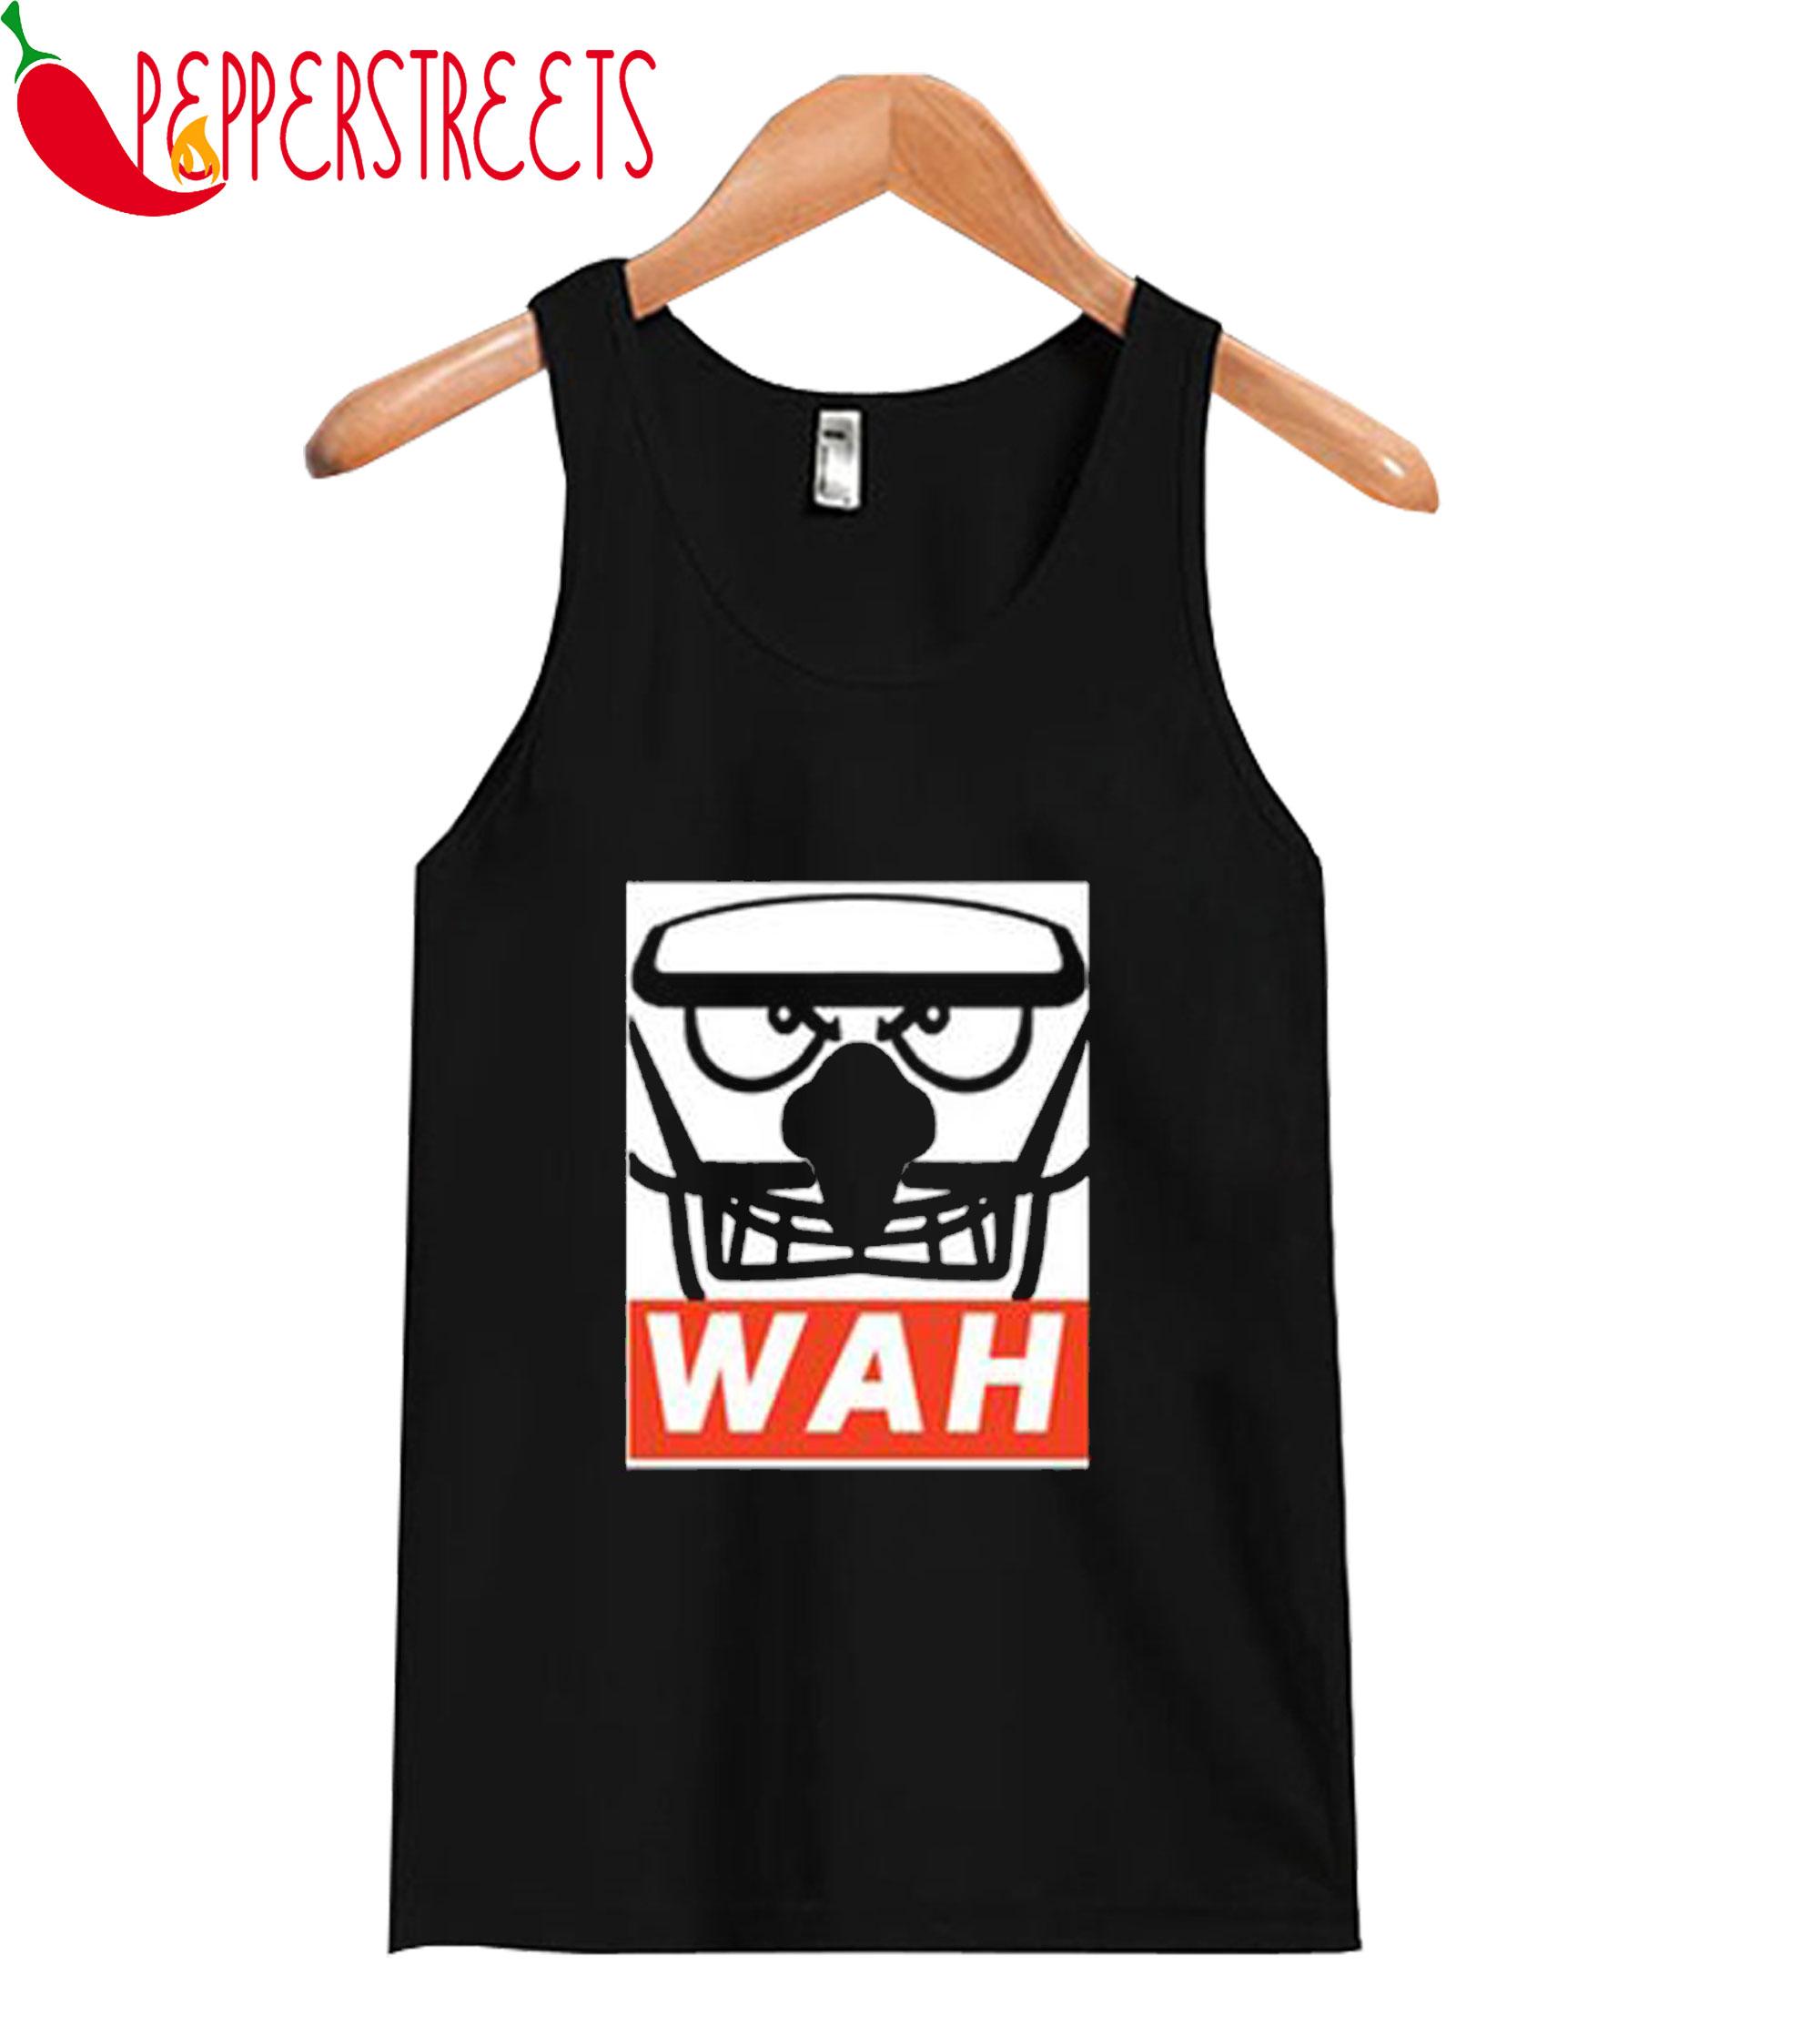 Wah Tank-Top